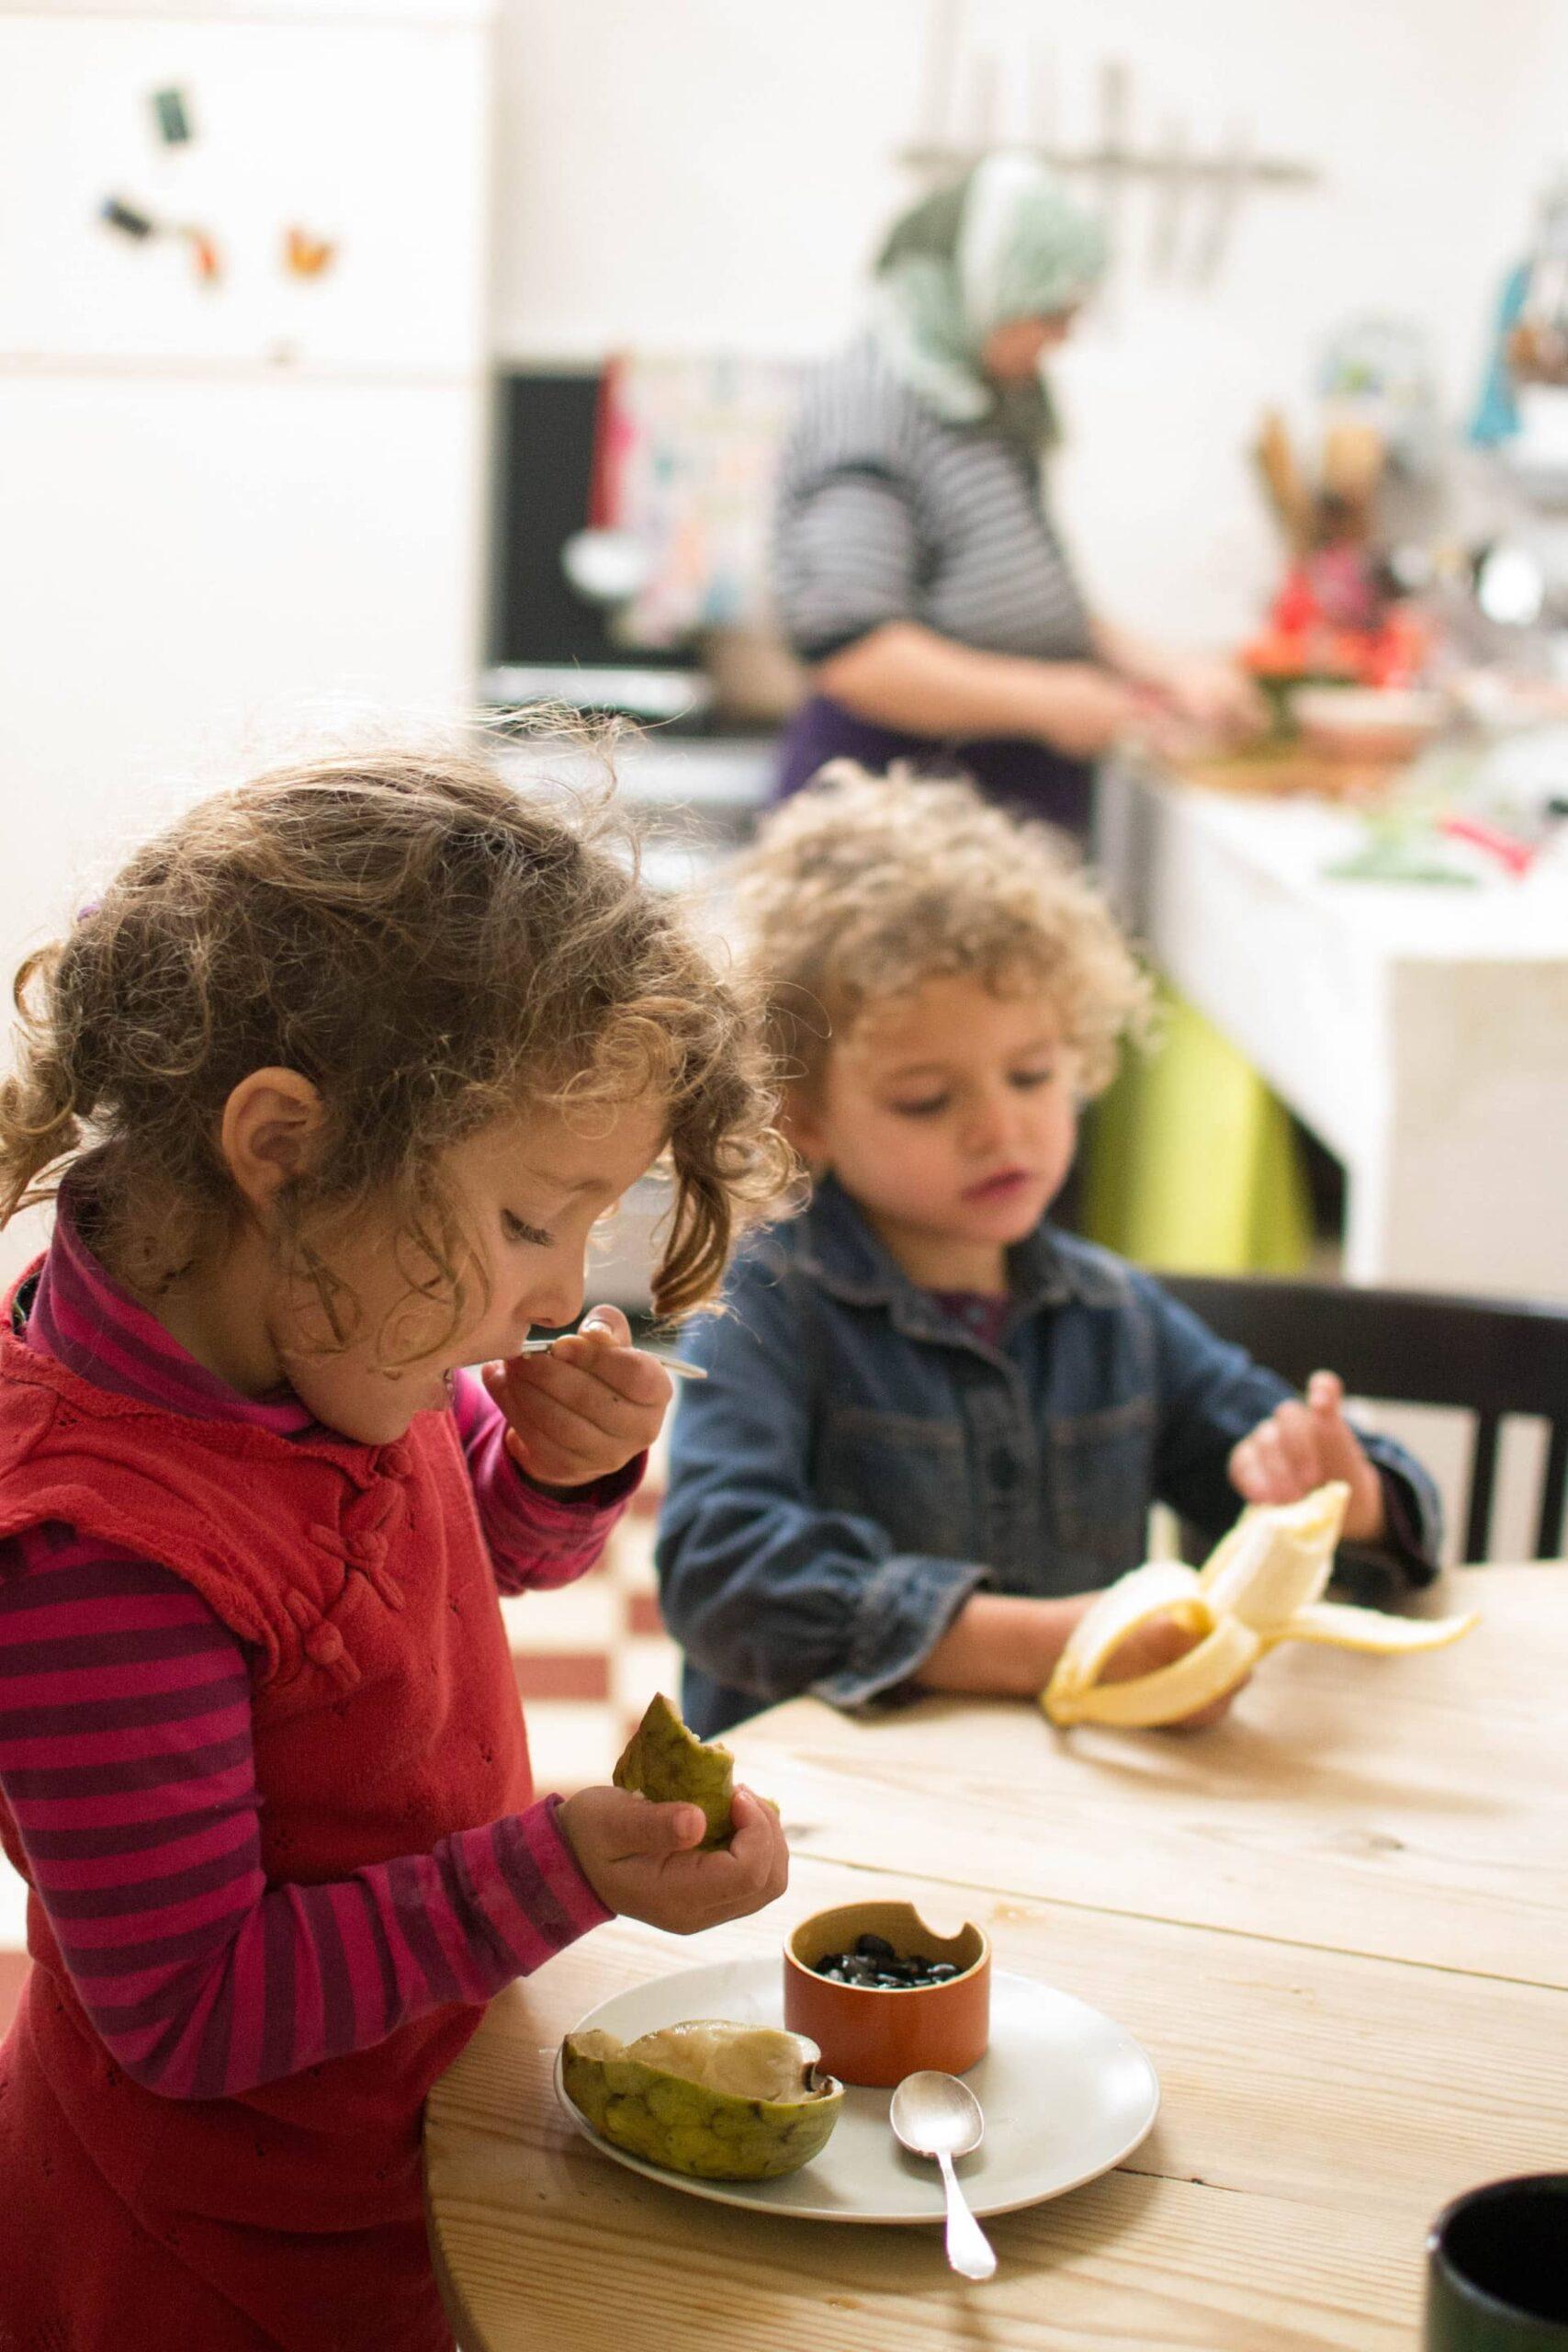 simple ways to prevent vitamin deficiencies in kids